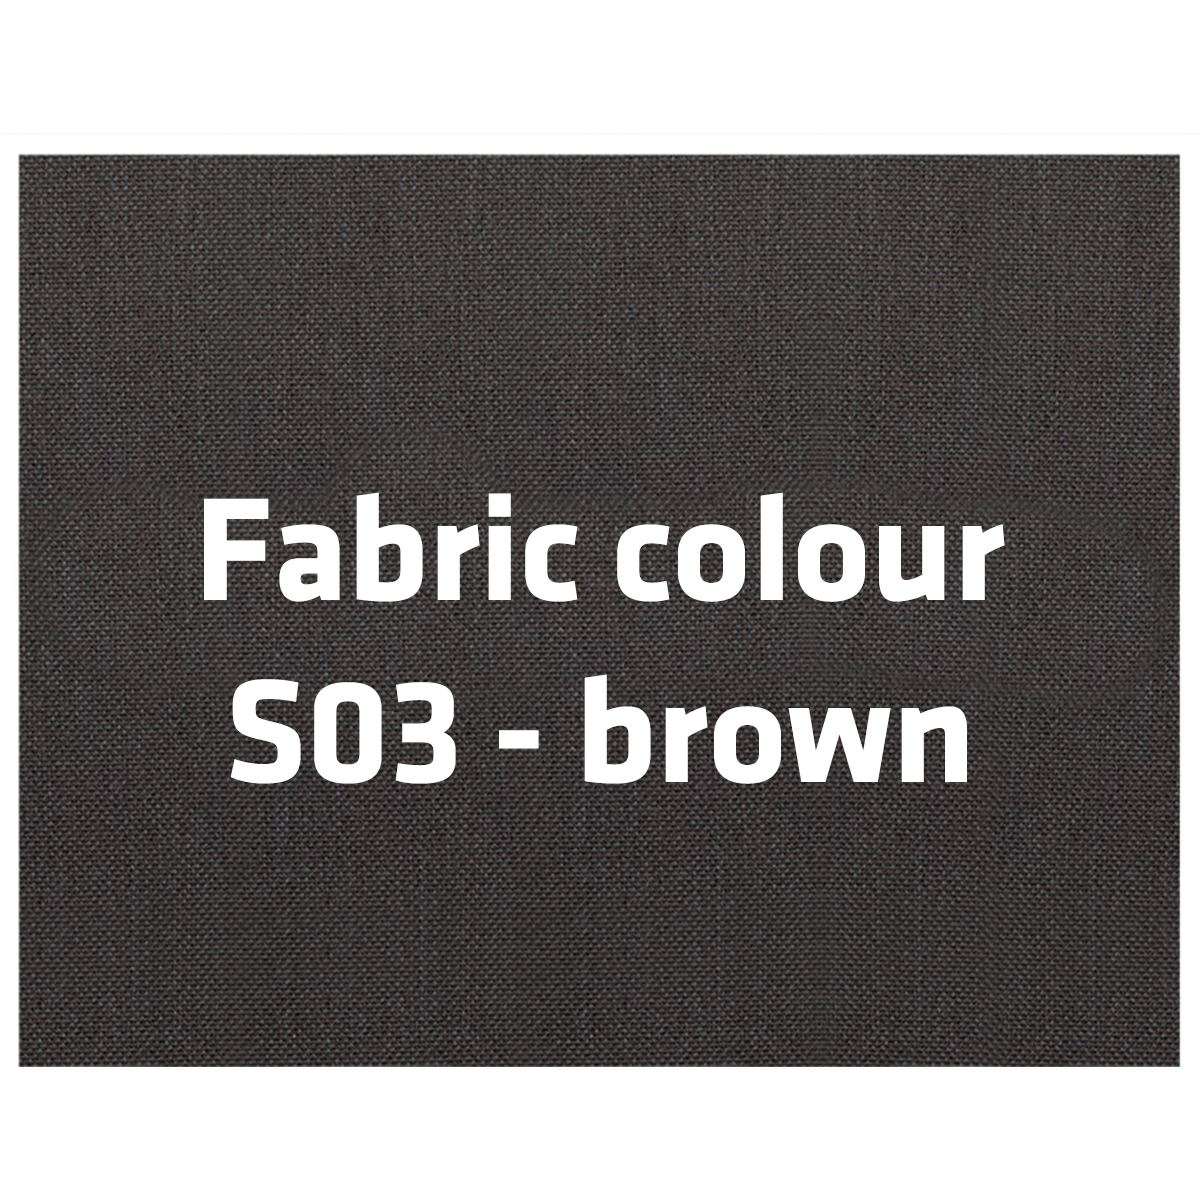 Stoff_S03_brown_Text_en_1200x1200px